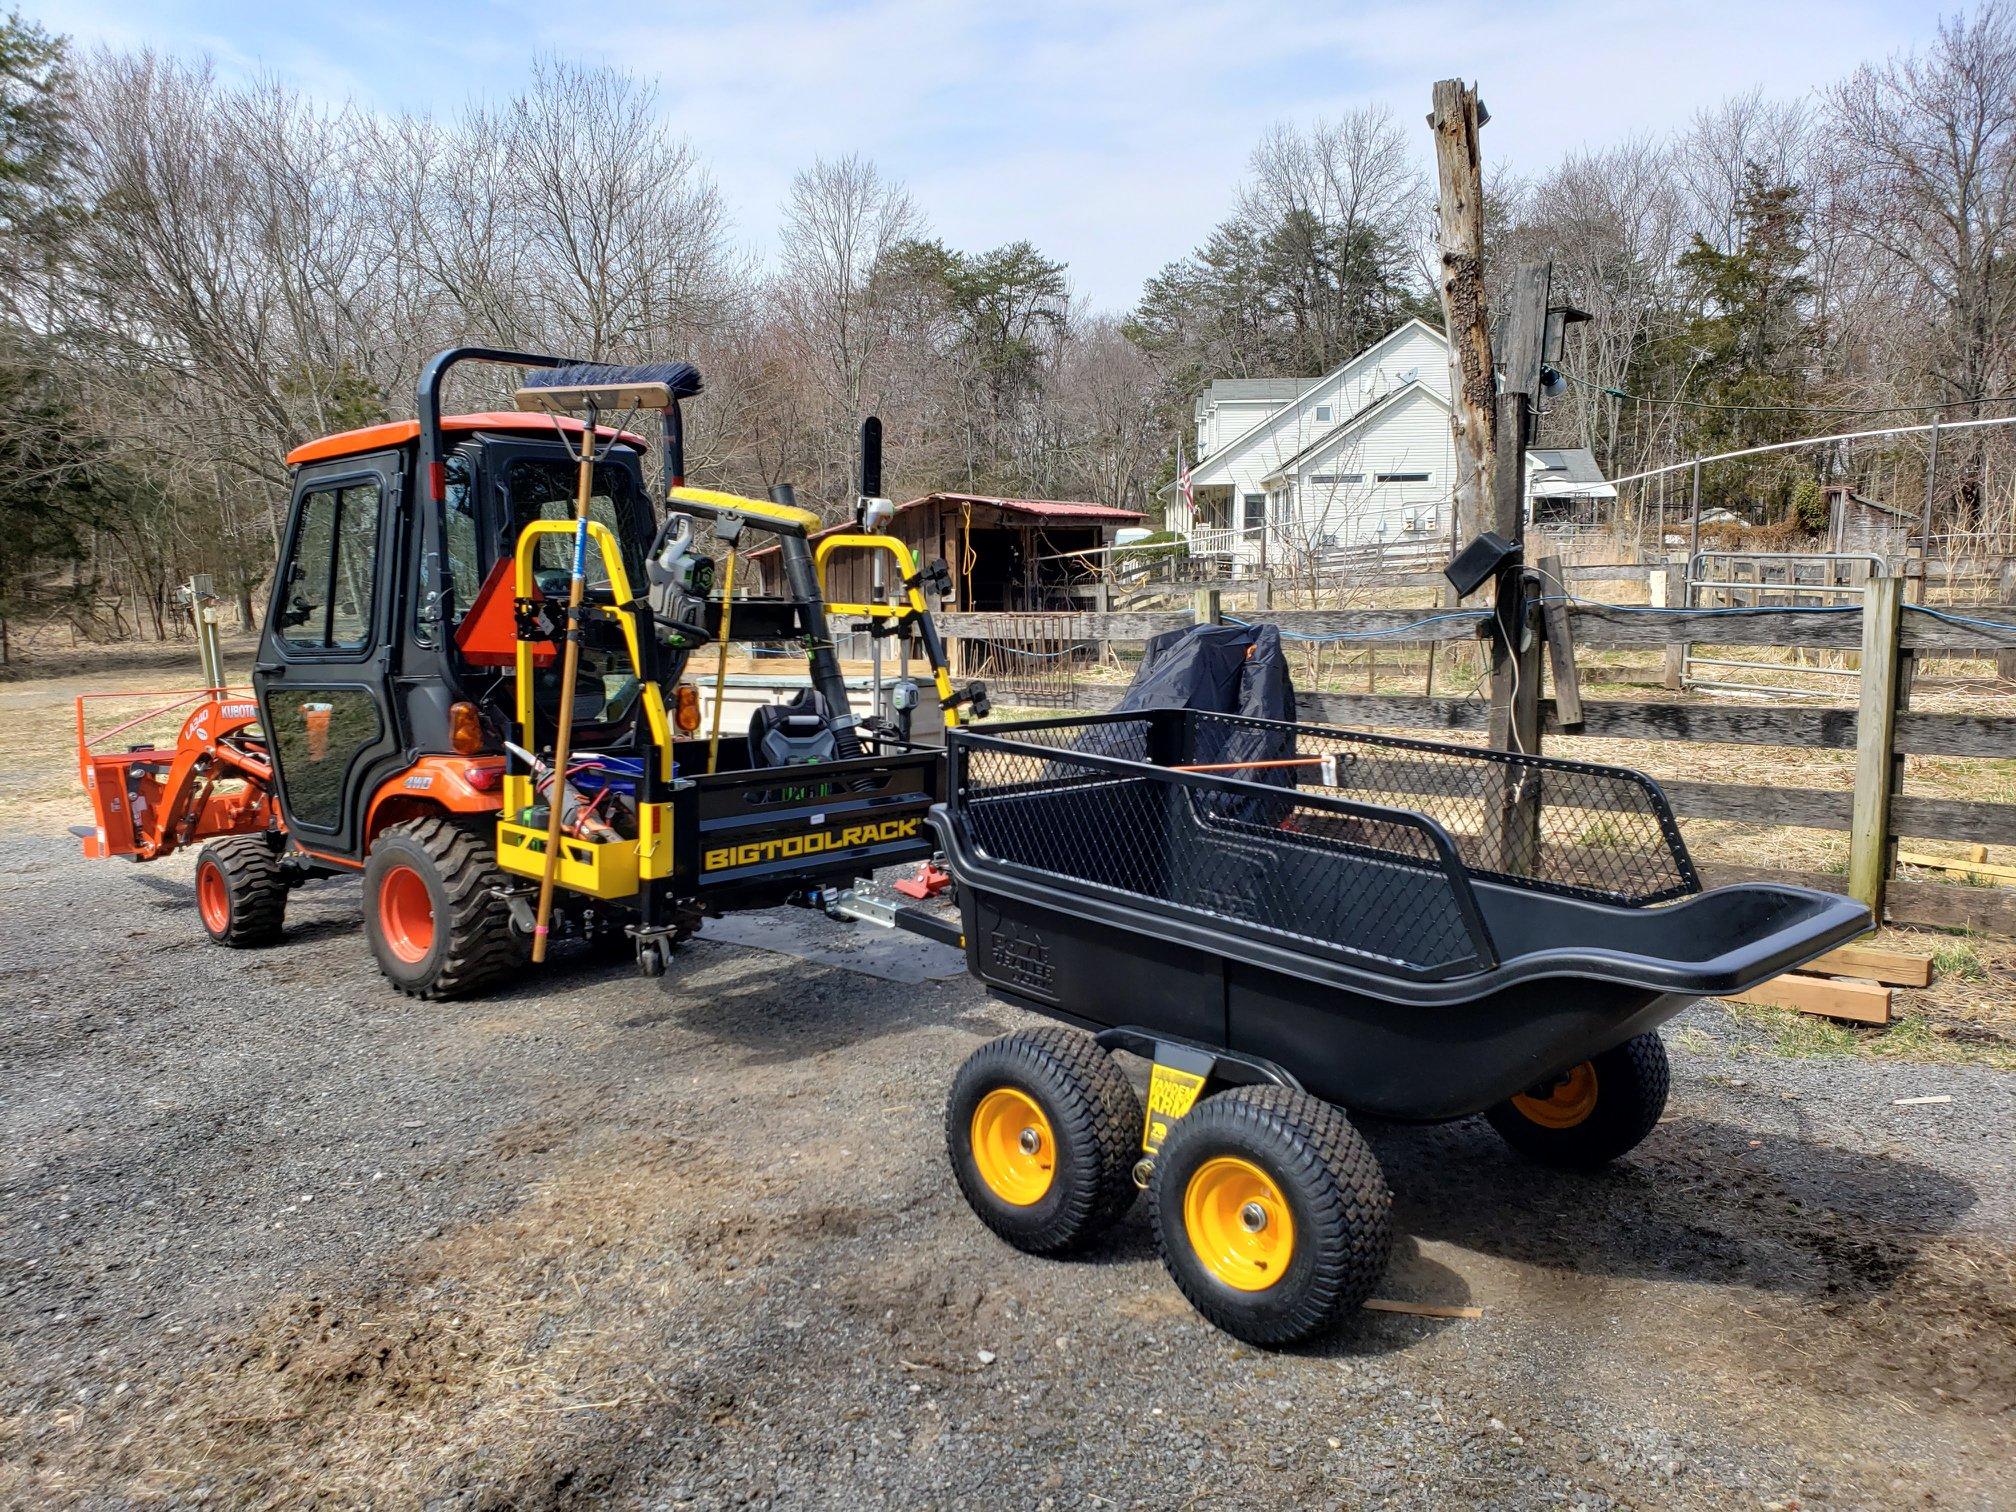 BigToolRack Photo Gallery | Tractor tool rack | Cool tractor